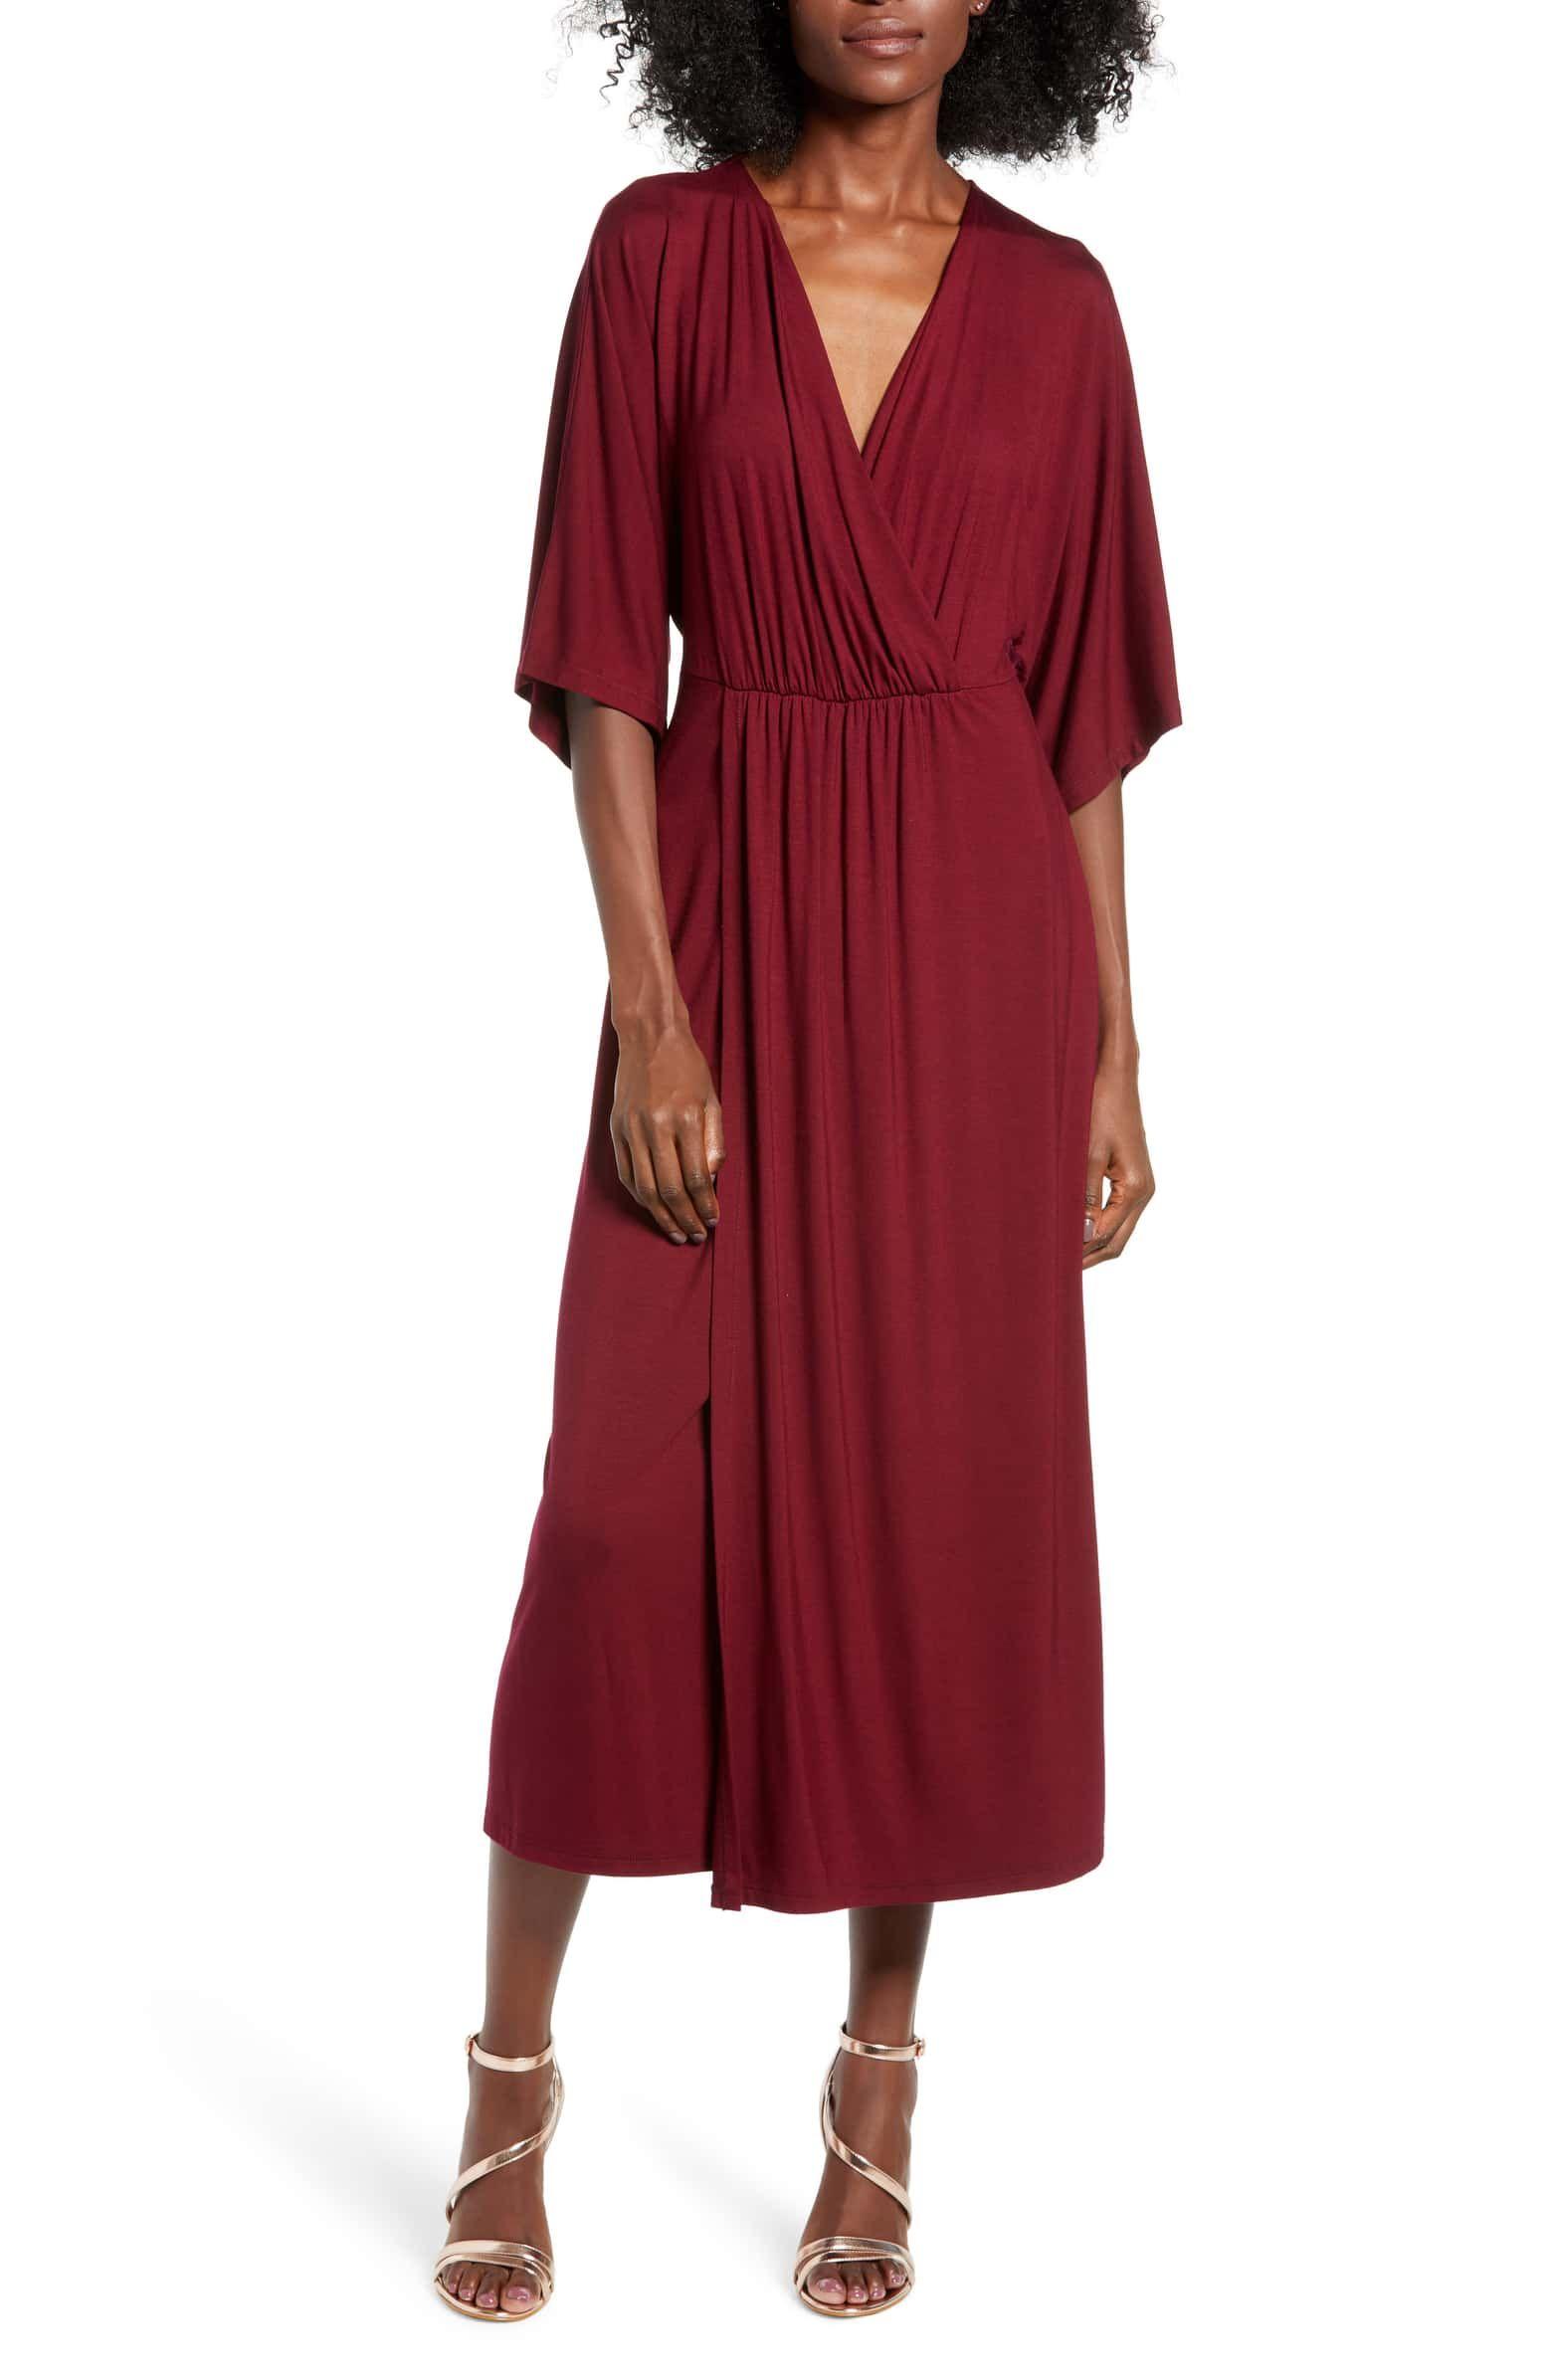 Kimono Sleeve Midi Dress Main Color Dark Wine Midi Dress With Sleeves Dresses Midi Dress [ 2392 x 1560 Pixel ]